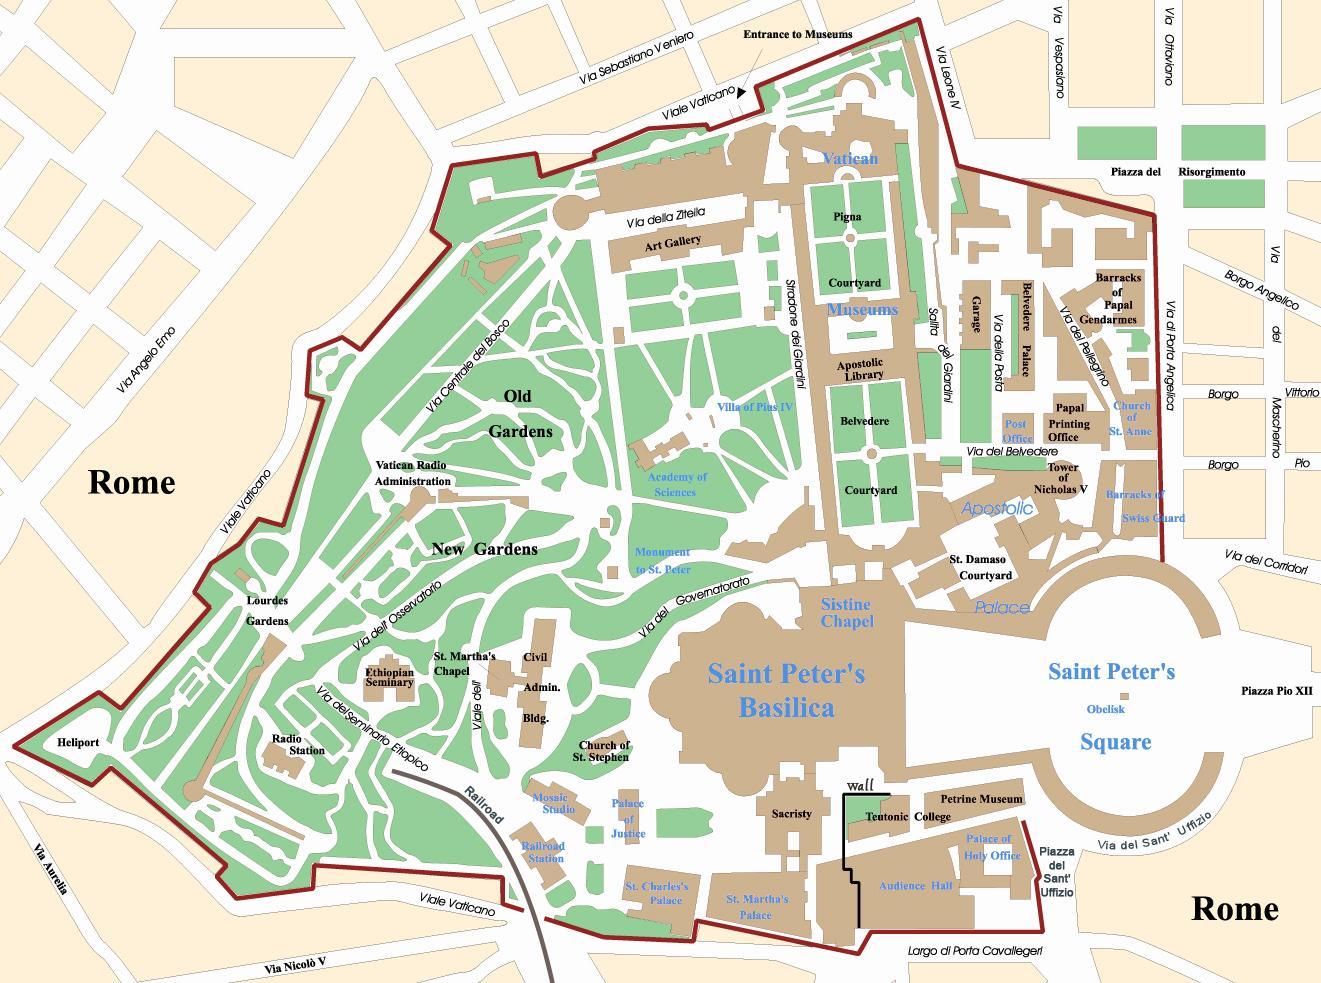 Vatikanet Pa Kort Kort Over Vatikanet Pa Det Sydlige Europa